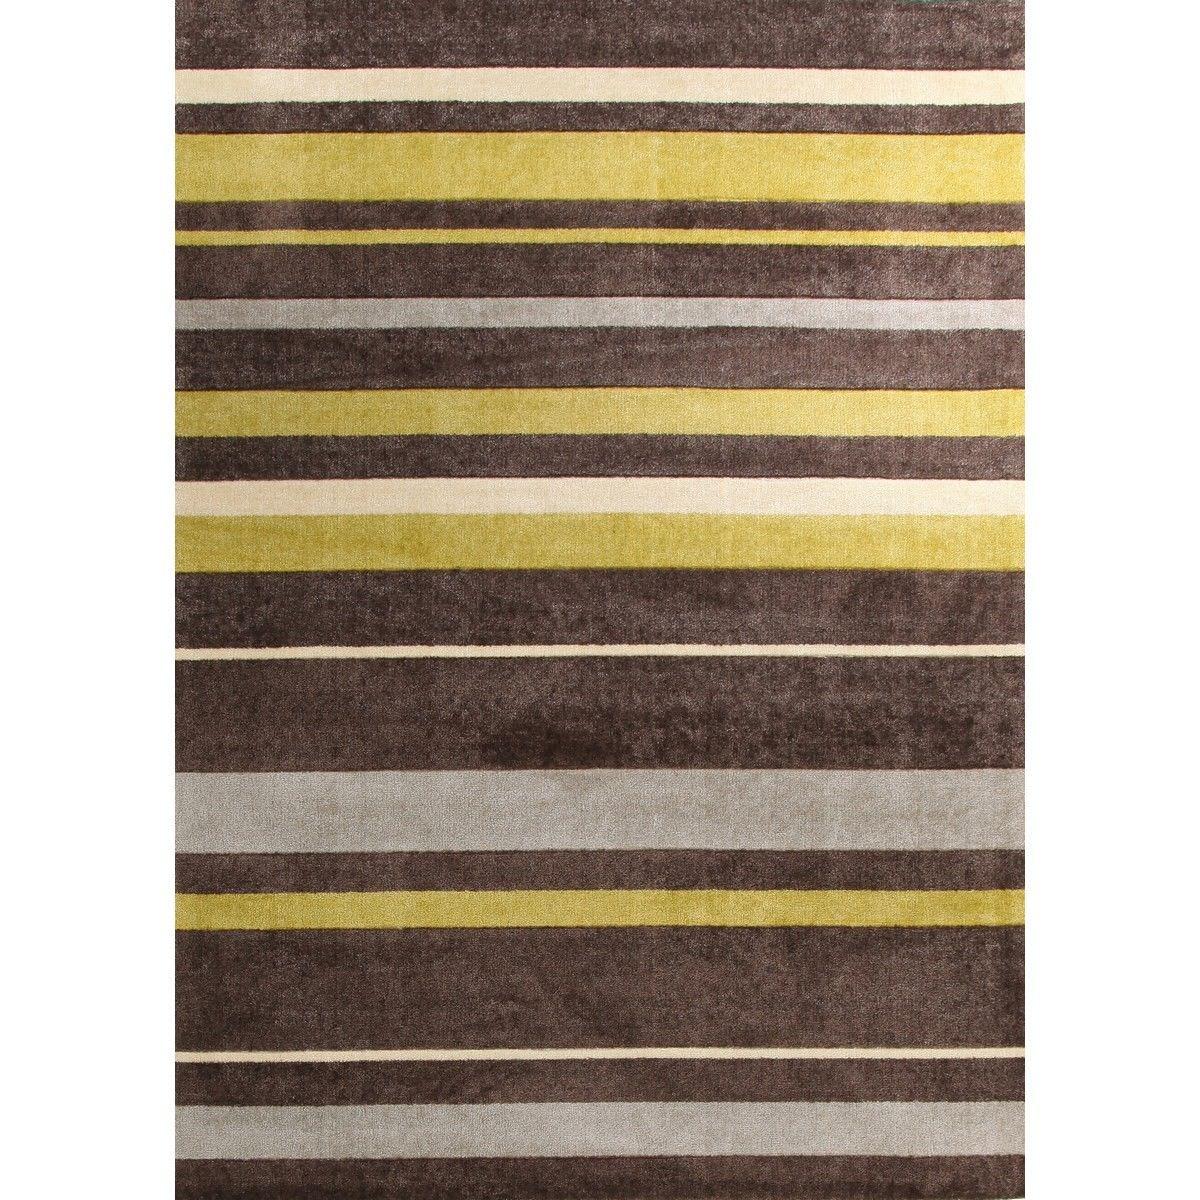 City Stylish Stripe Modern Rug, 220x150cm, Brown / Green